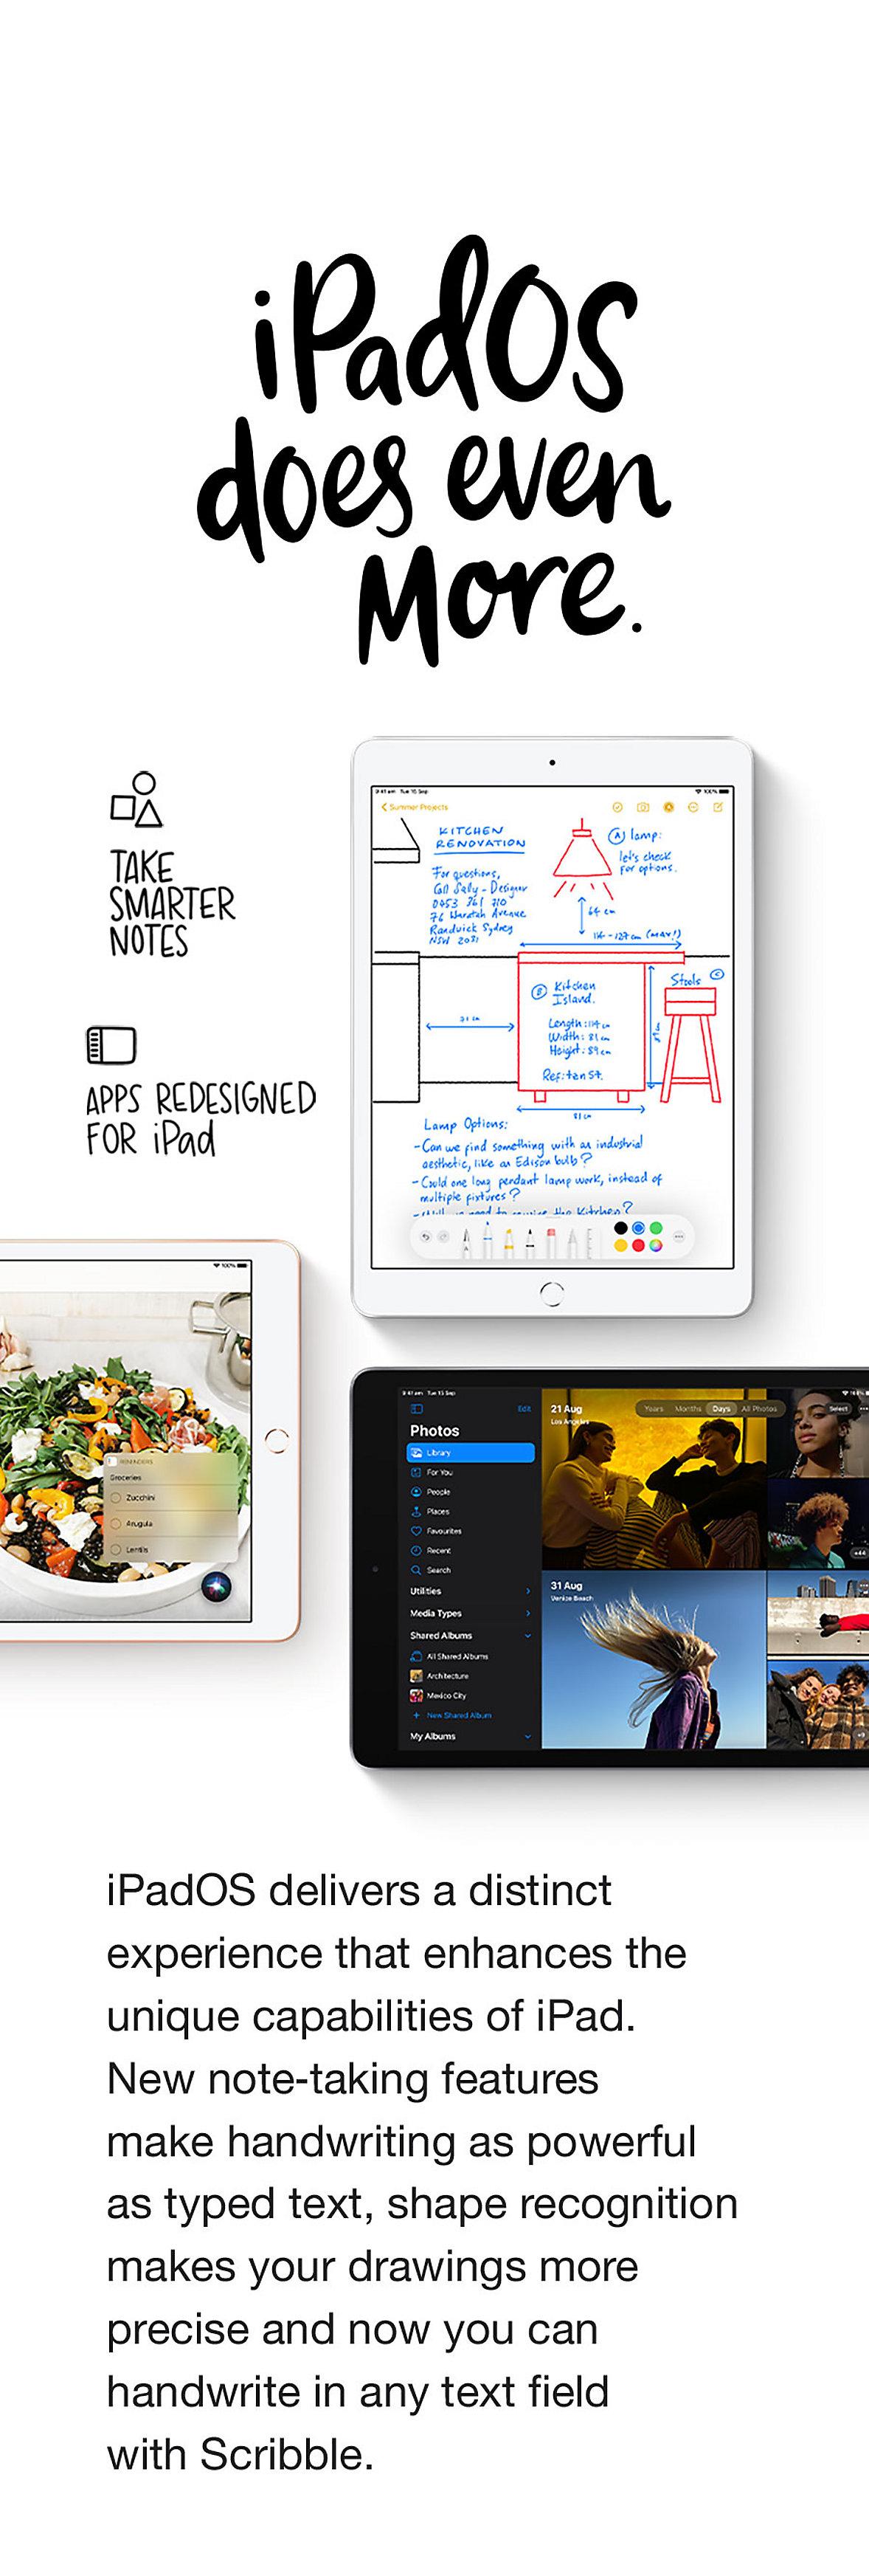 iPadOS does even more